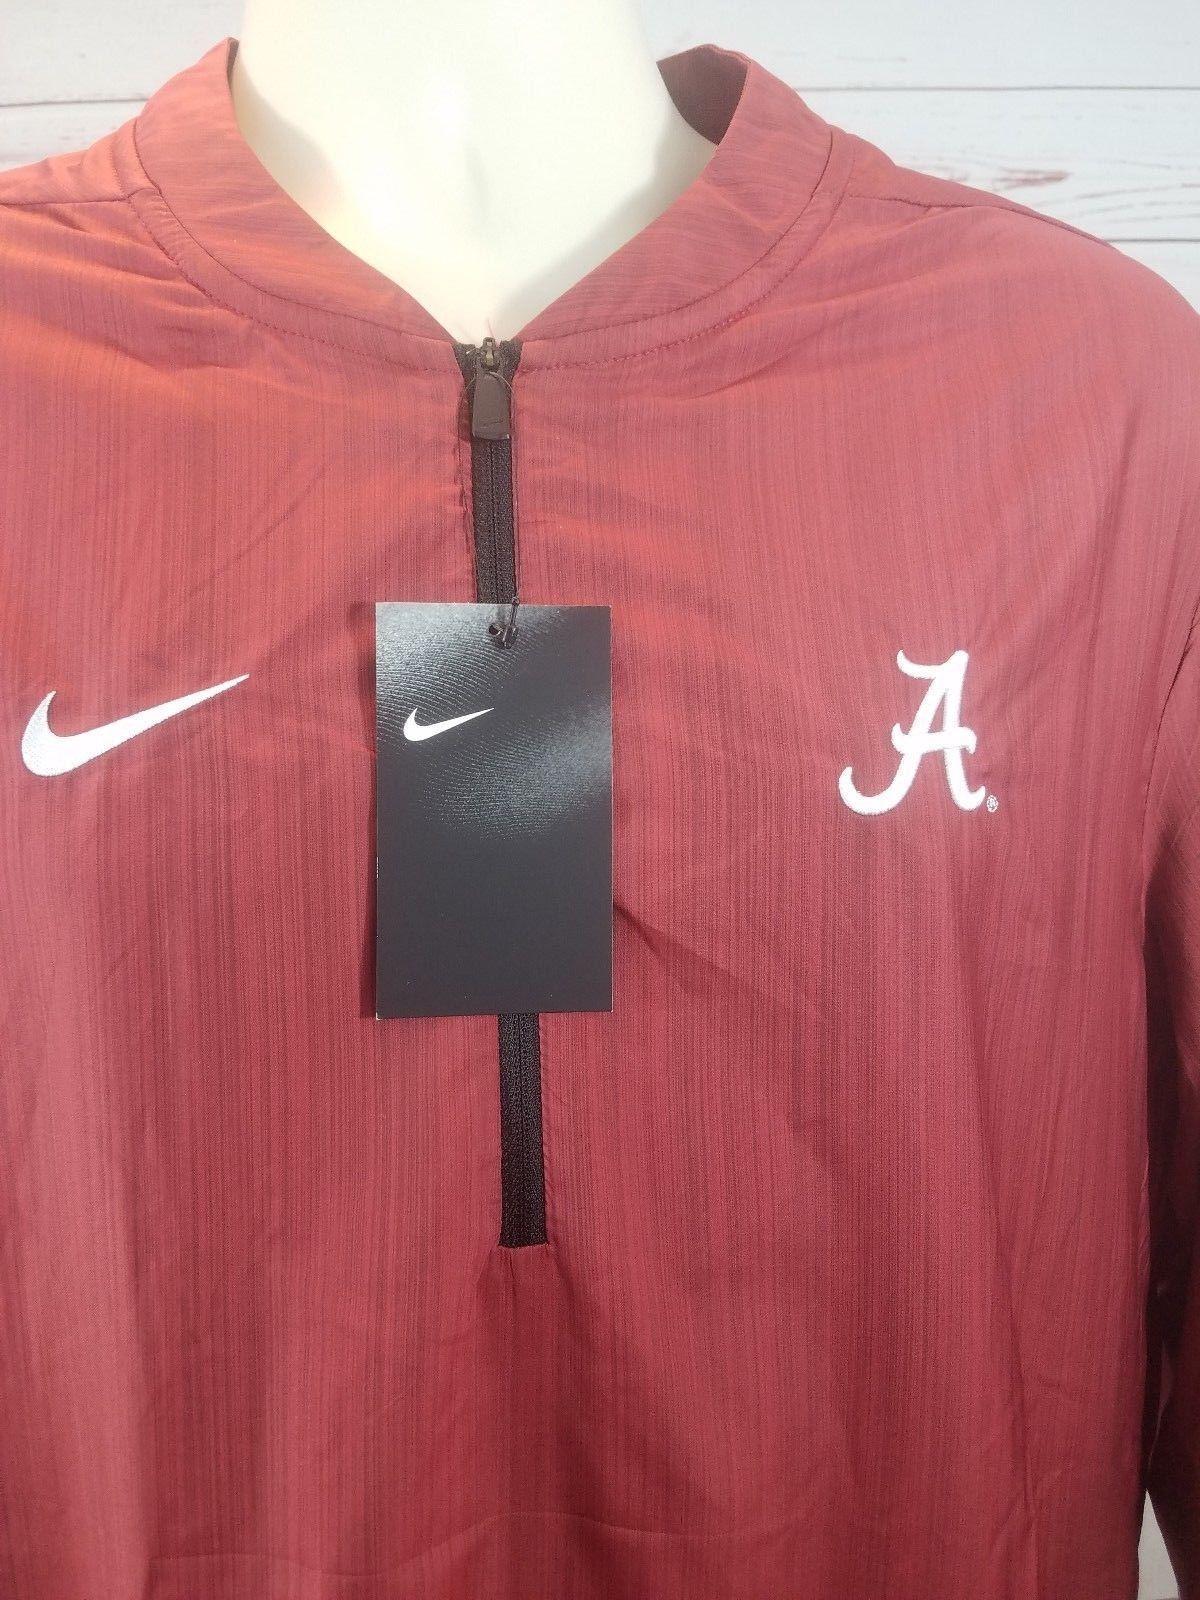 ea147eb0 S l1600. S l1600. Previous. Nike Alabama Crimson Tide Lockdown Jacket Men's  Large Red 1/4 Zip ...